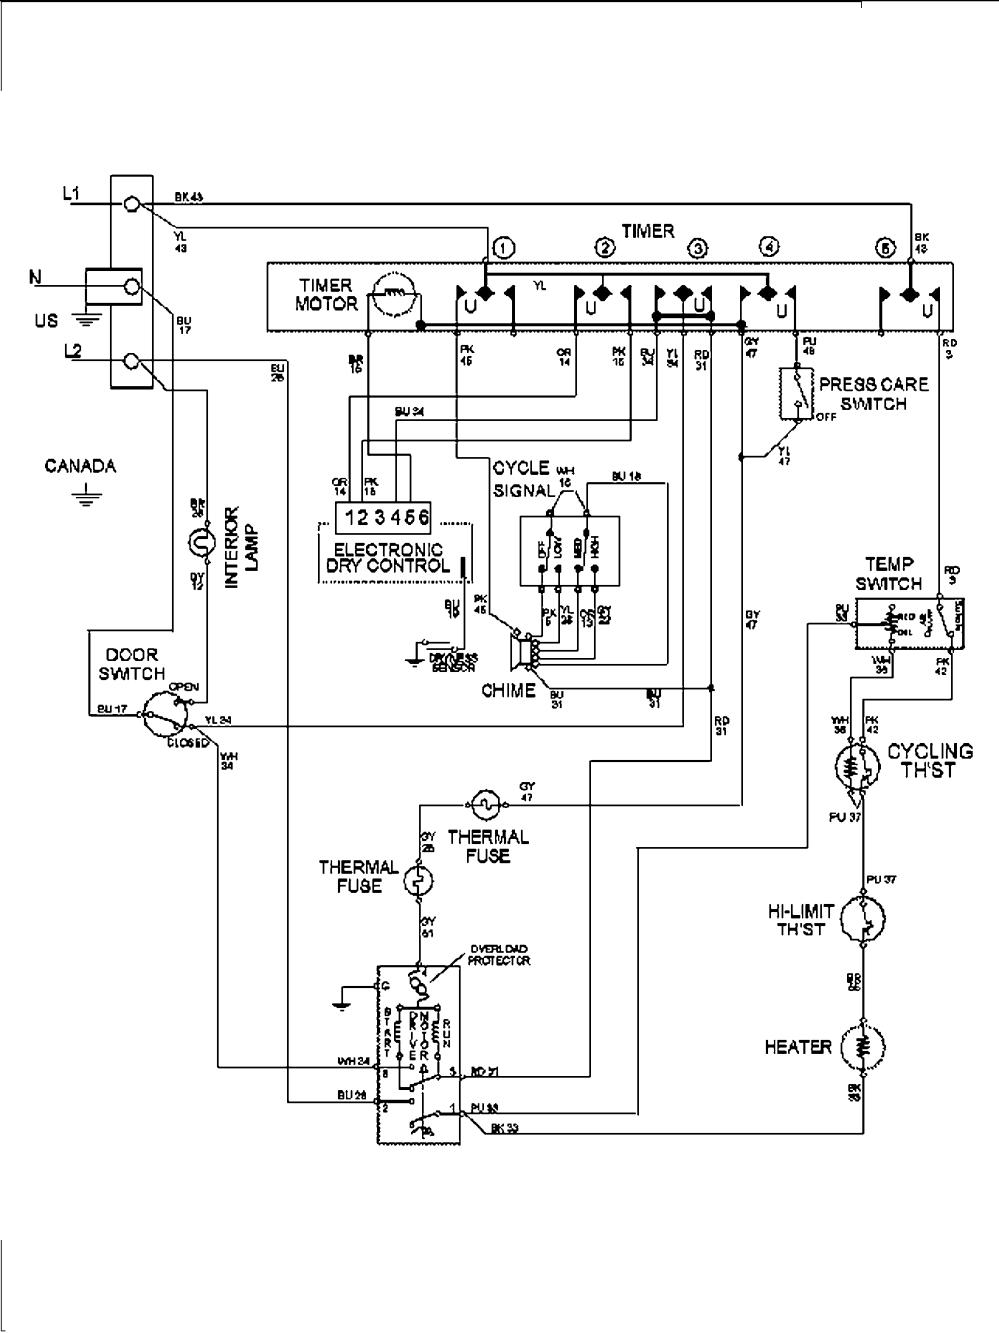 medium resolution of laundry dryer wiring diagram wiring diagram blogs estate dryer wiring diagram wiring diagram for clothes dryer